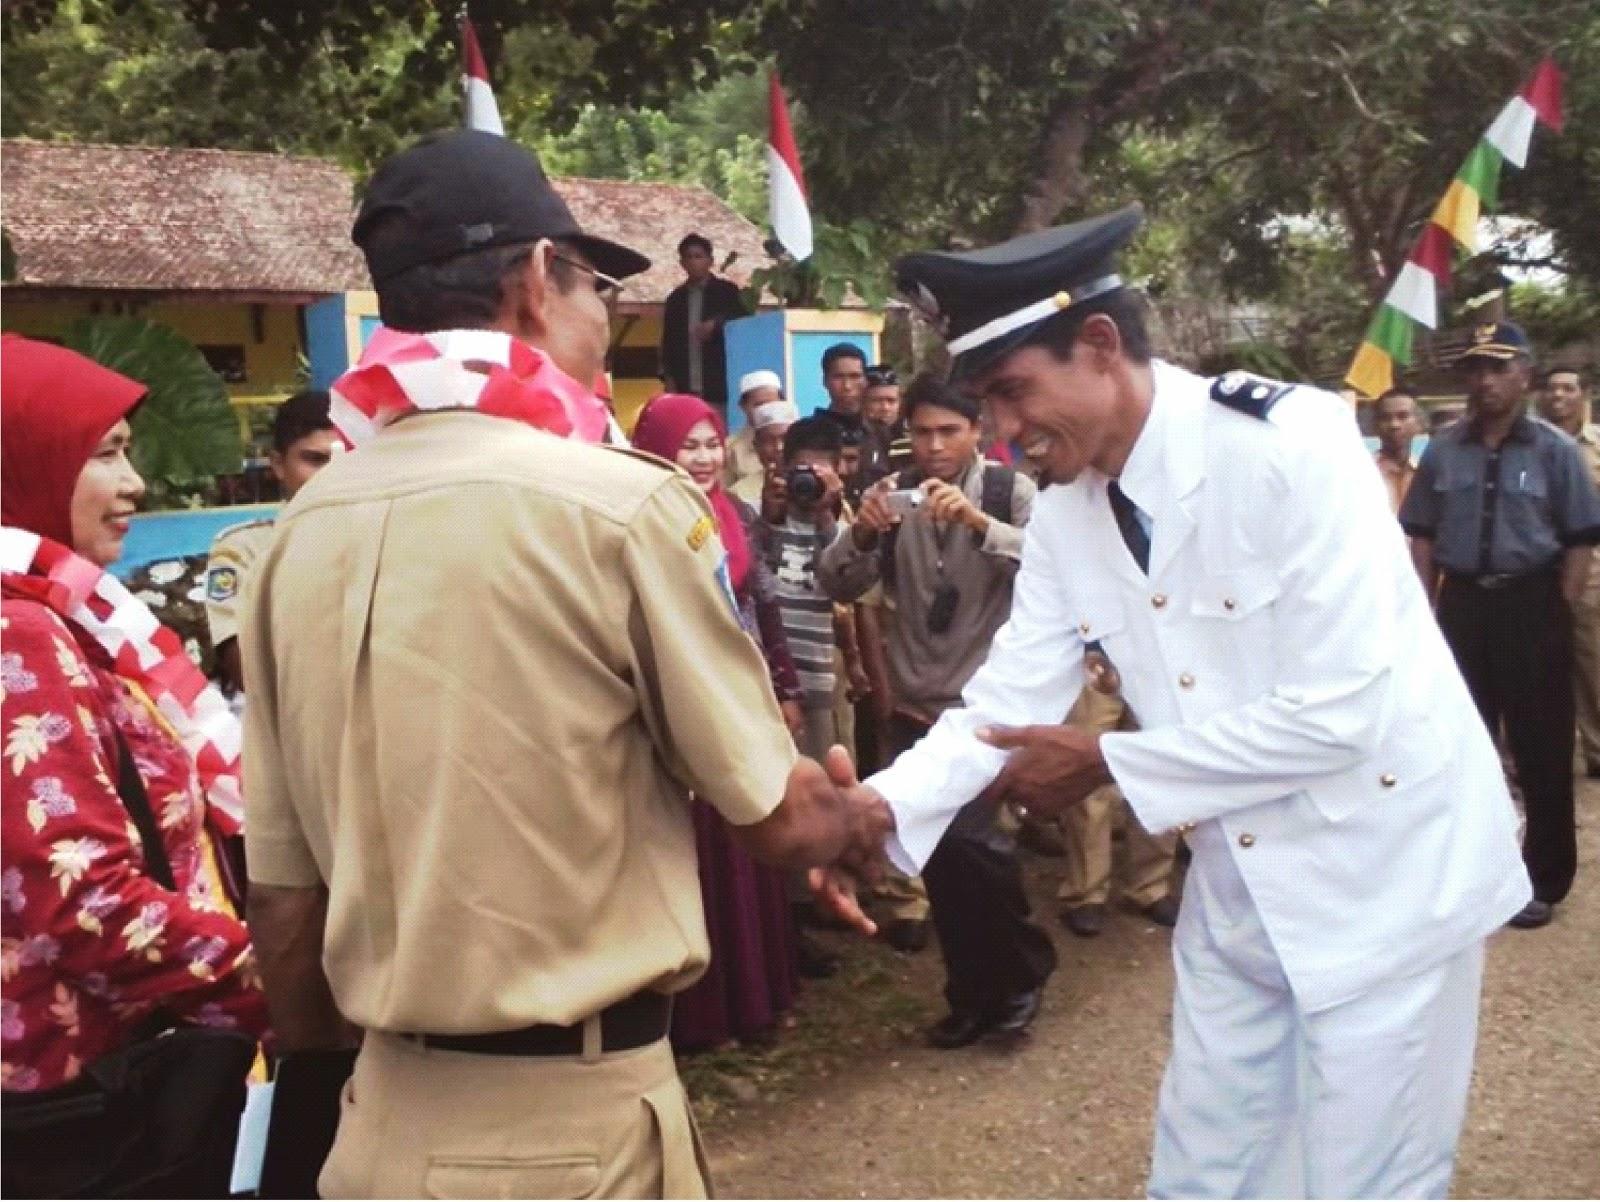 Sambori Ingin Kembalikan Ikon Desa Budaya